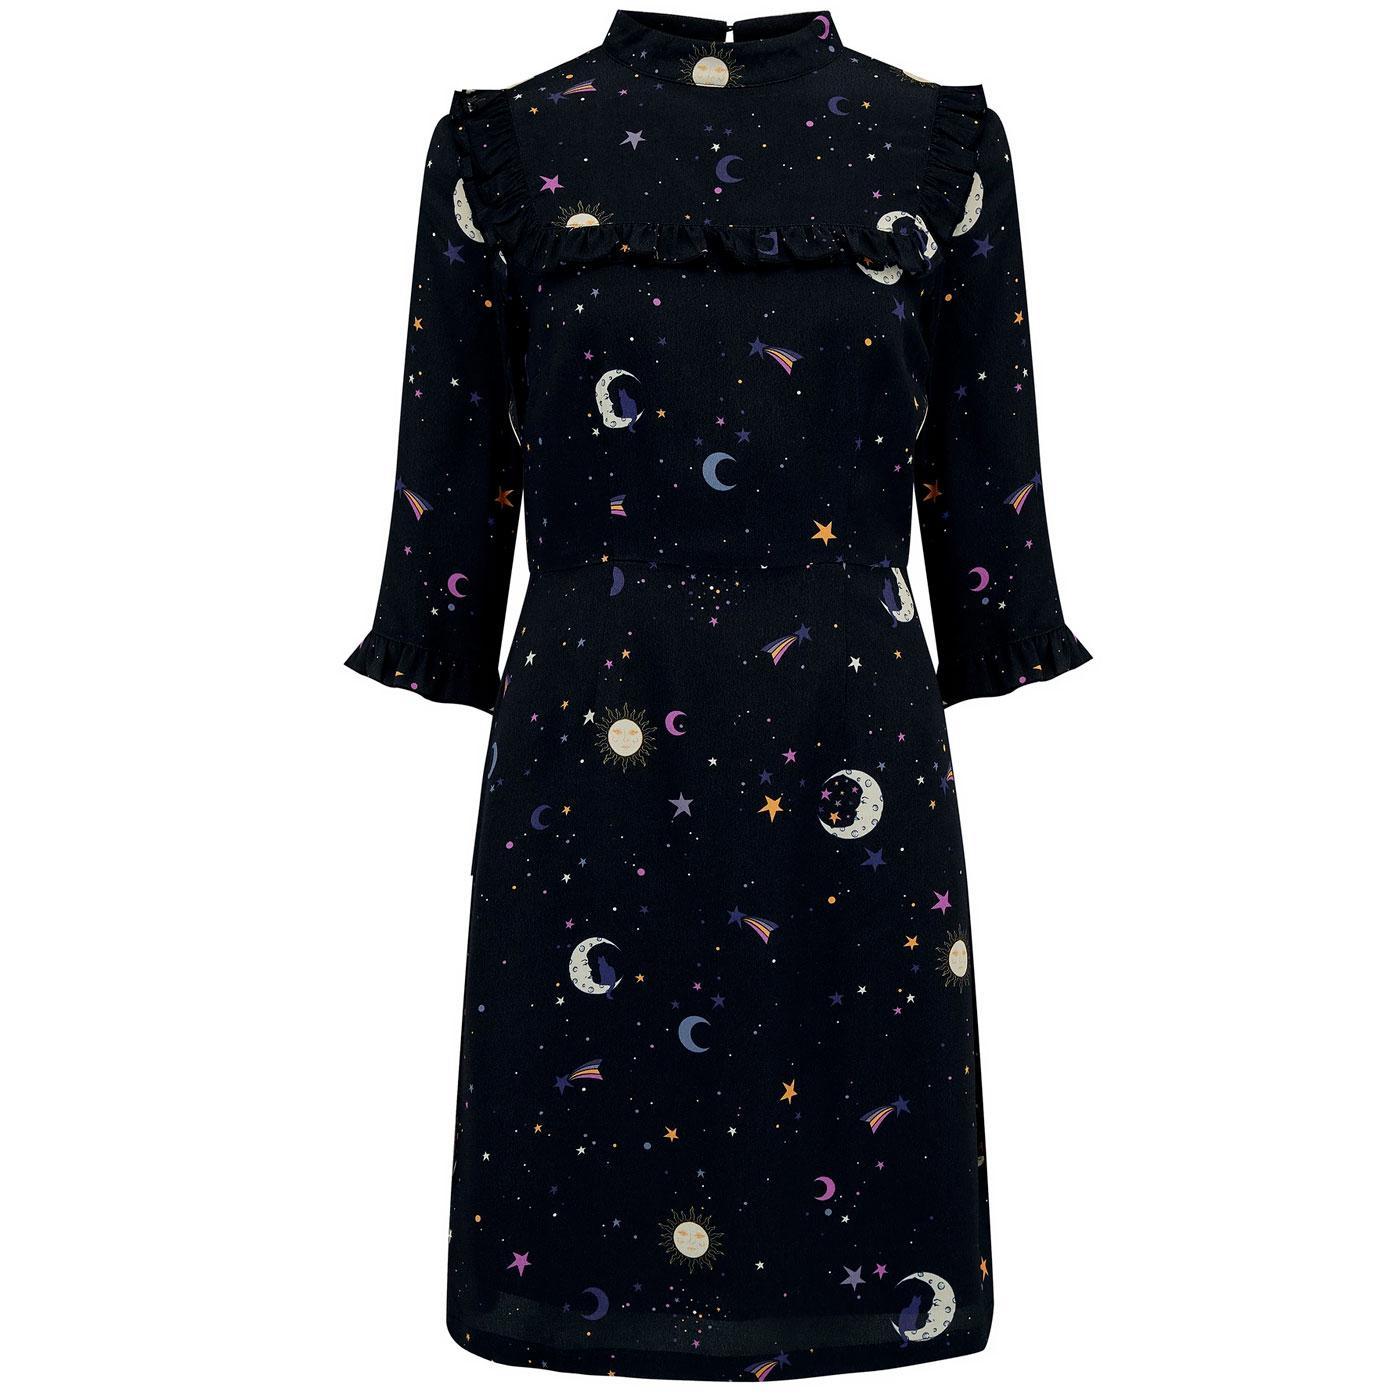 Cynthia SUGARHILL BRIGHTON Retro Stars Frill Dress